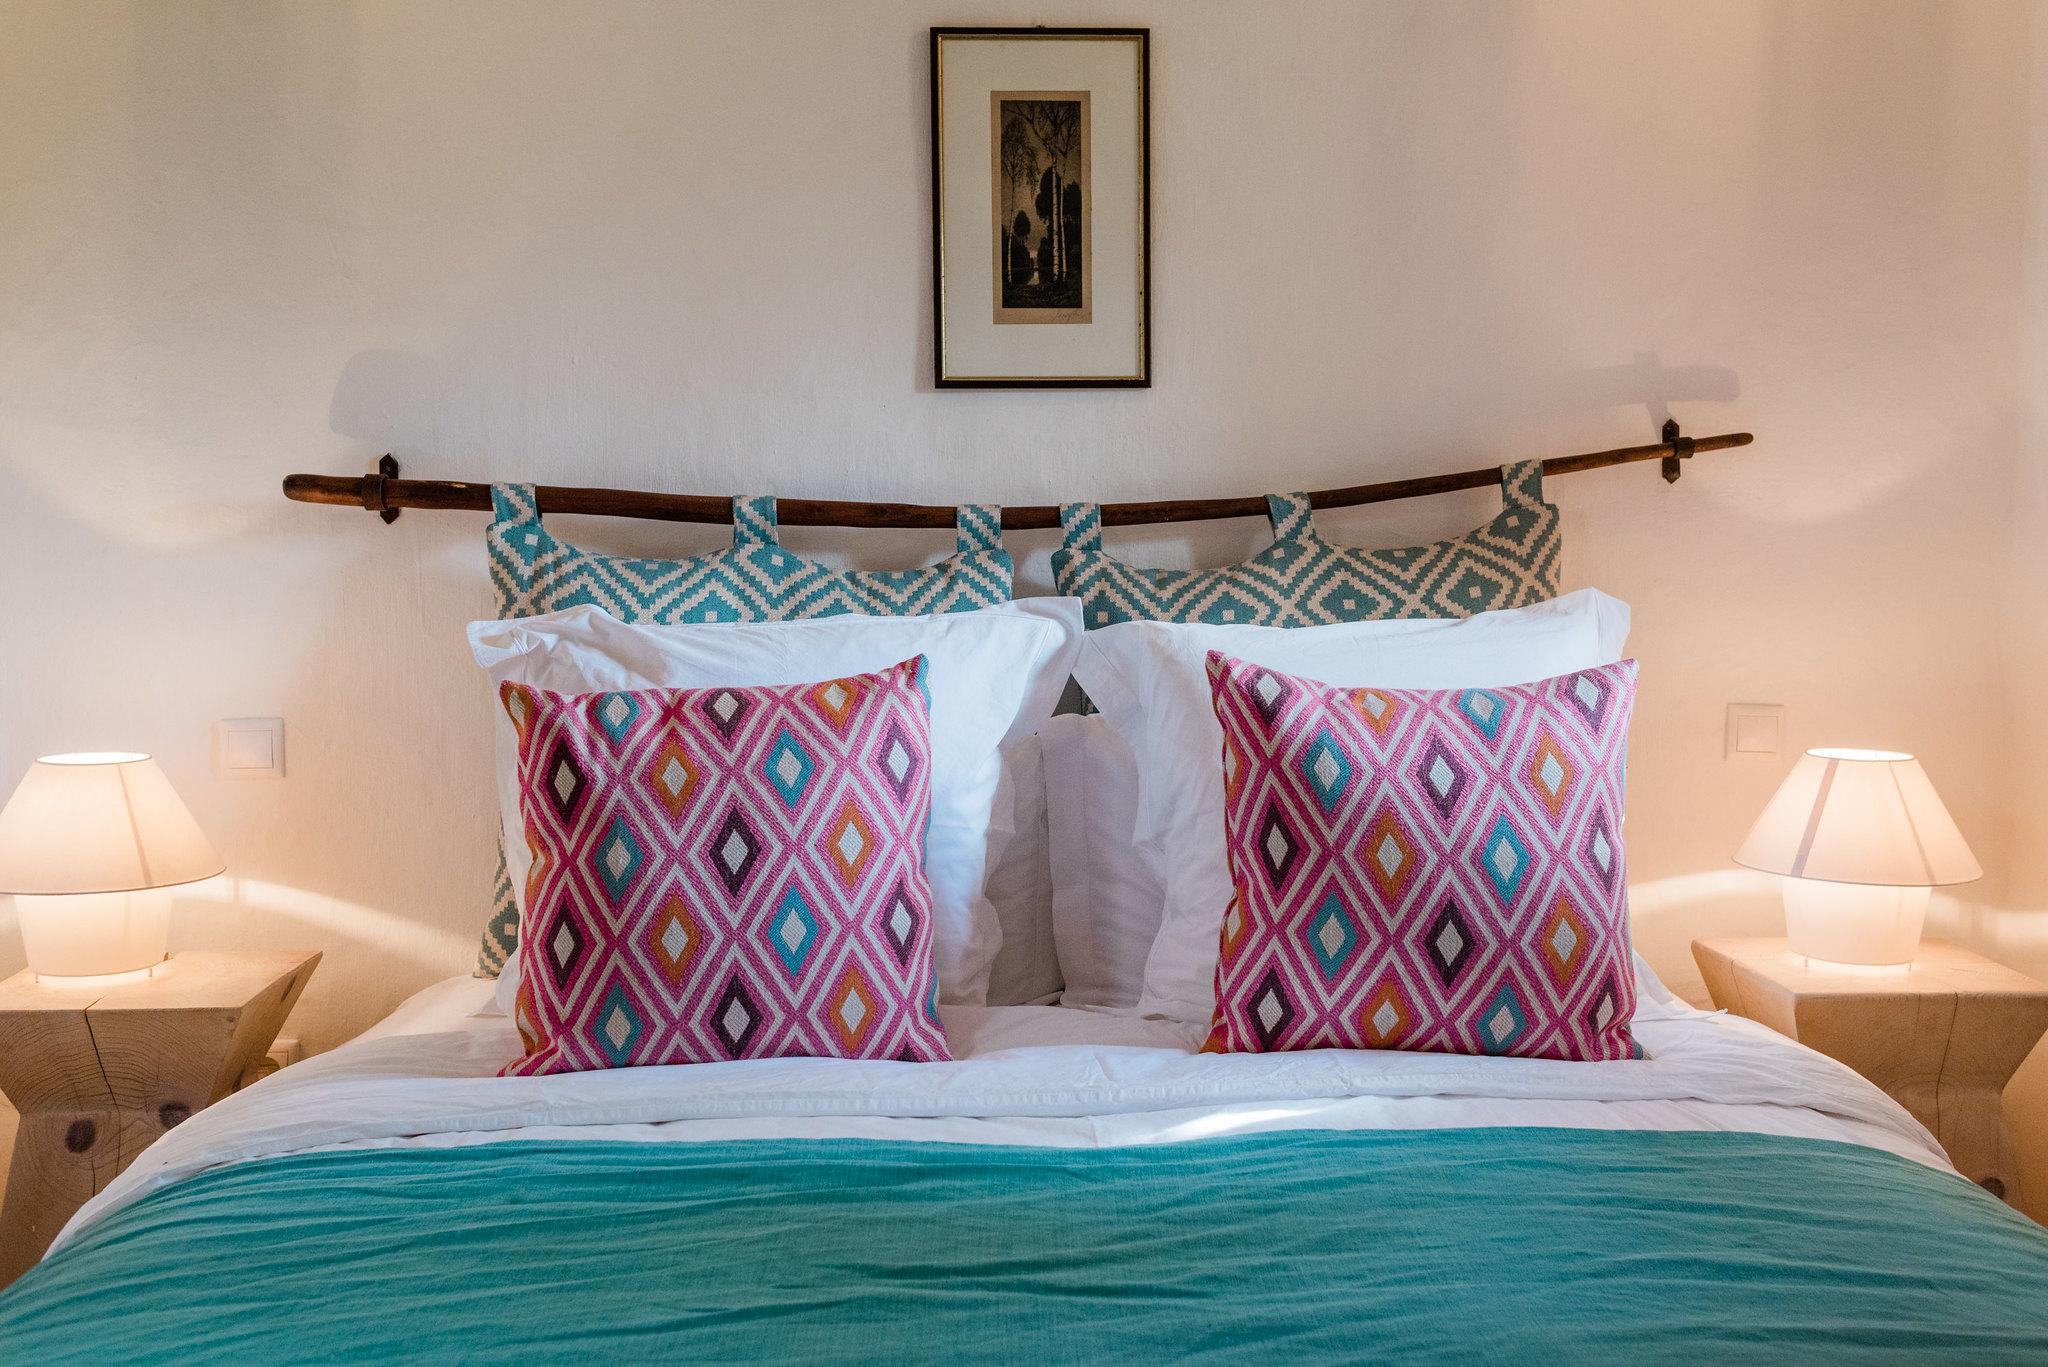 https://www.white-ibiza.com/wp-content/uploads/2020/05/white-ibiza-villas-can-sabina-interior-bedroom4.jpg